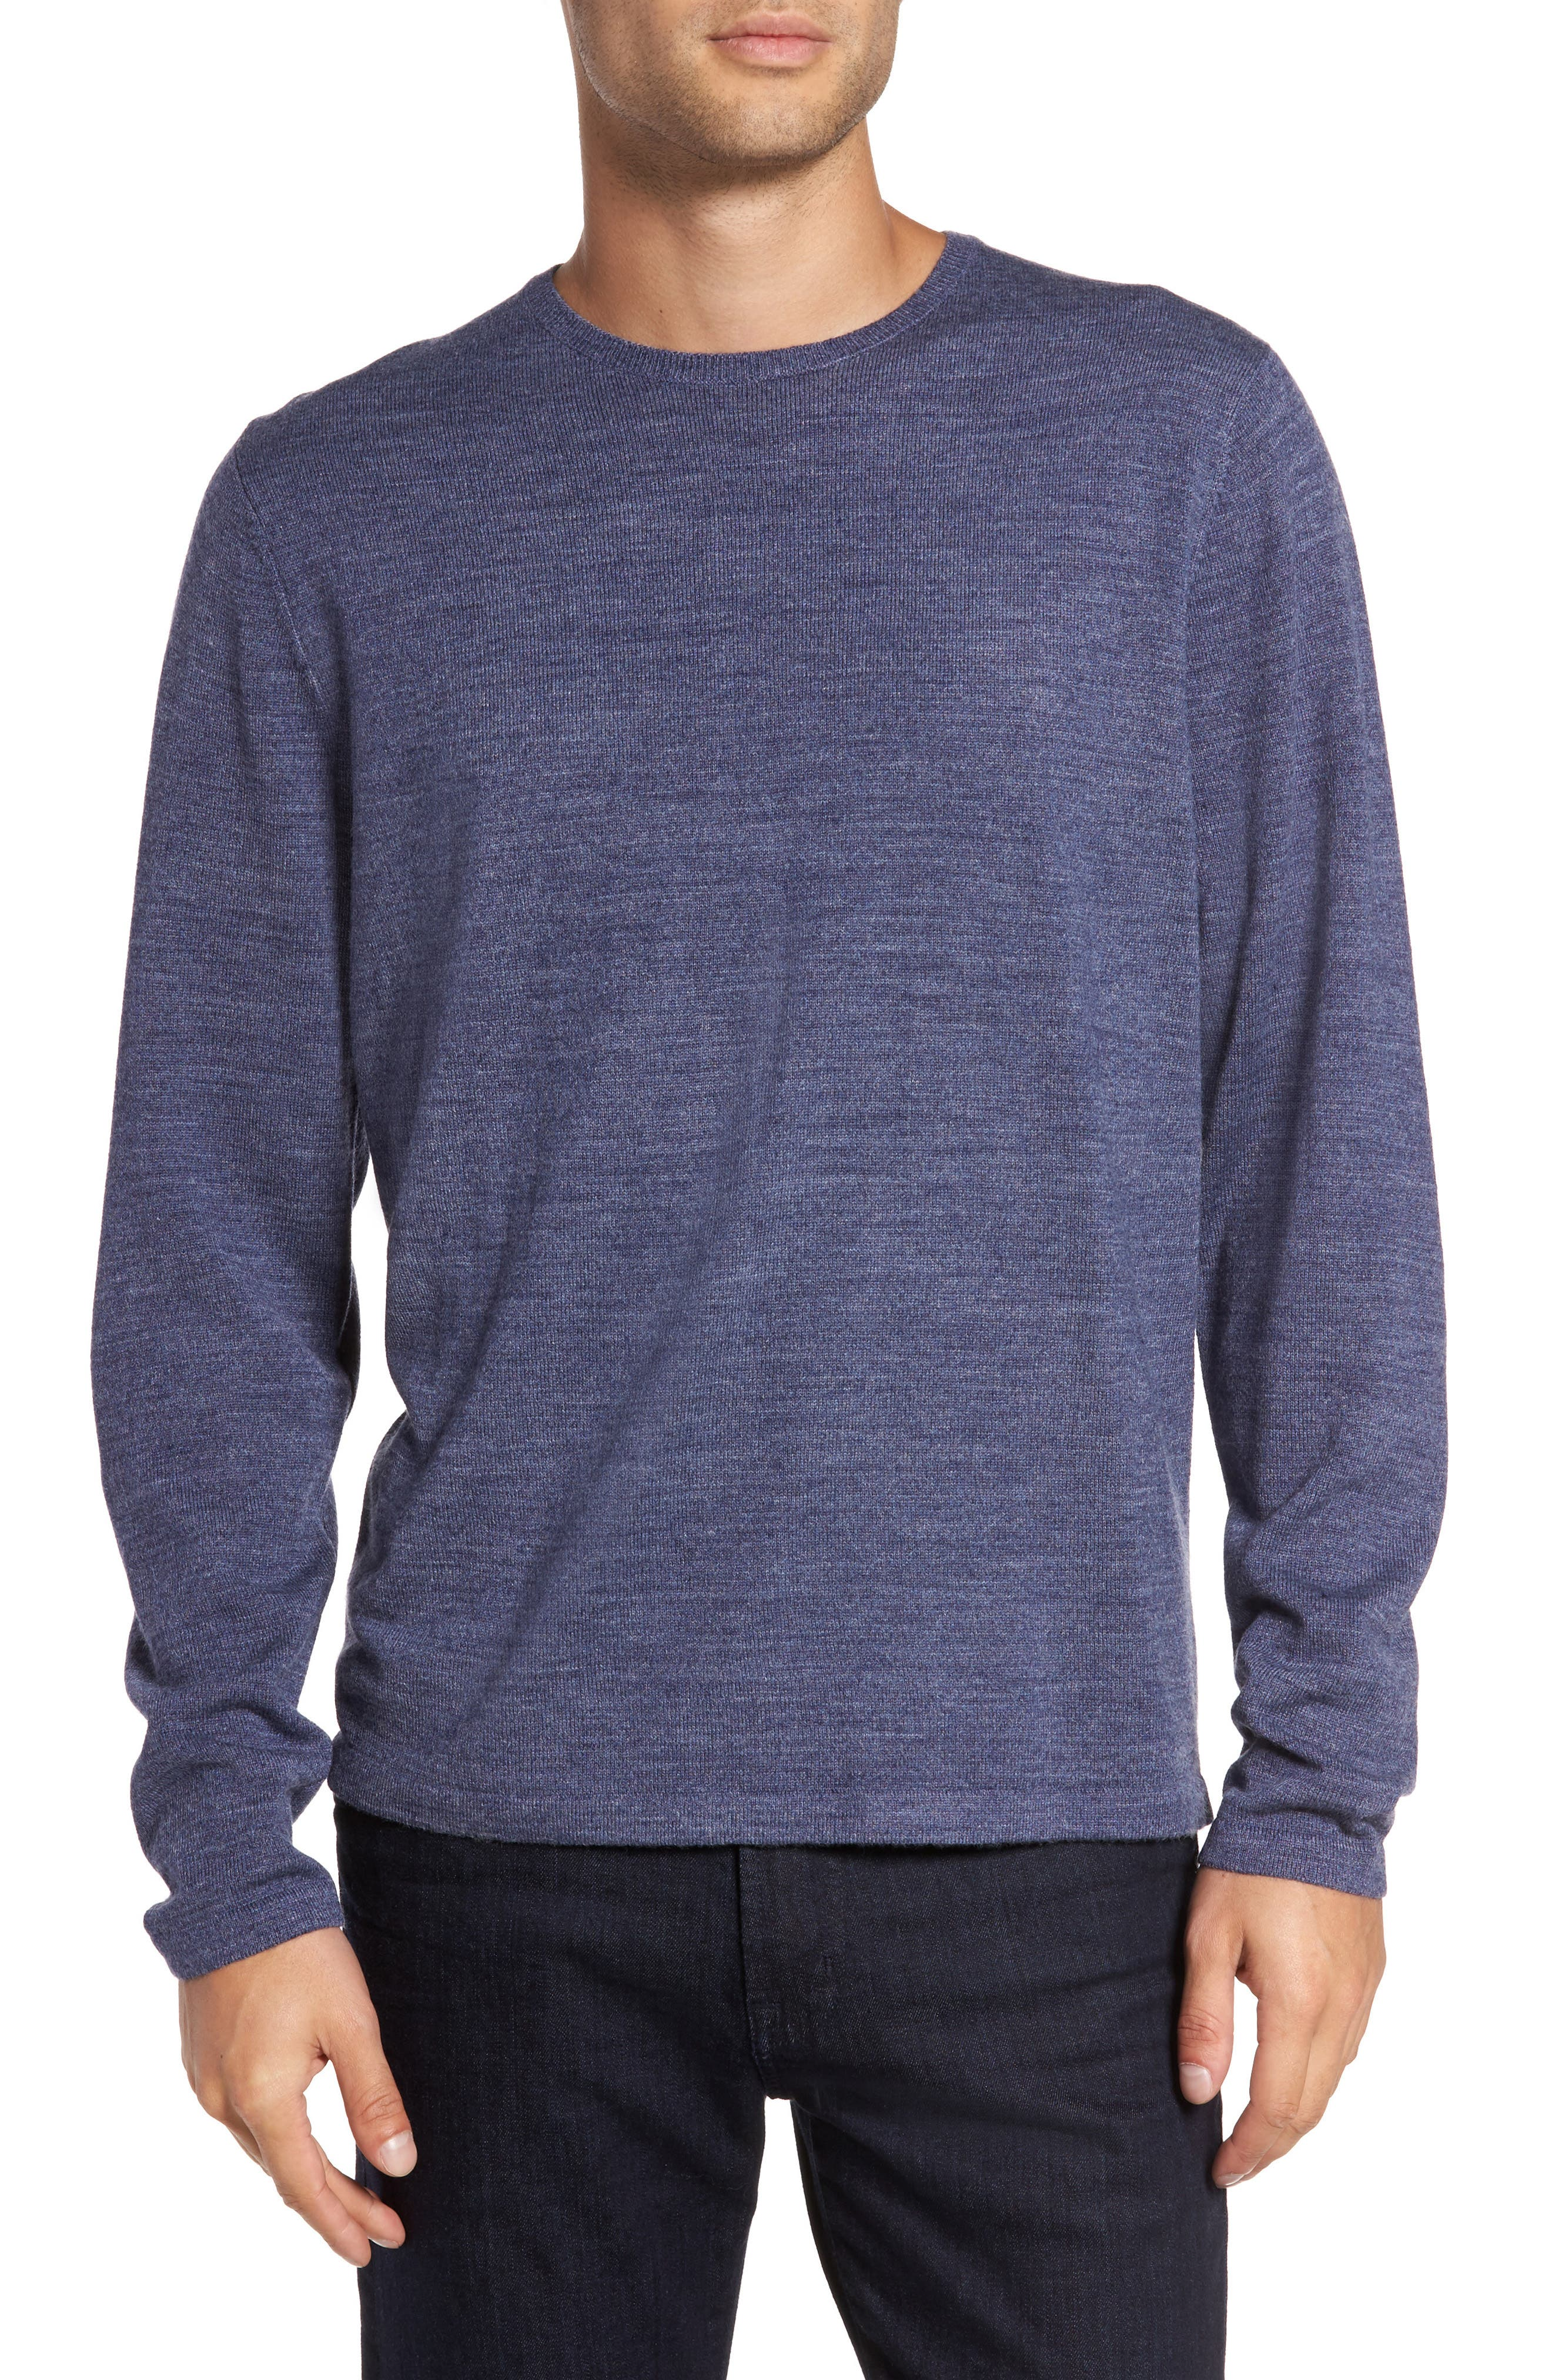 Main Image - Calibrate Merino Blend Crewneck Sweater